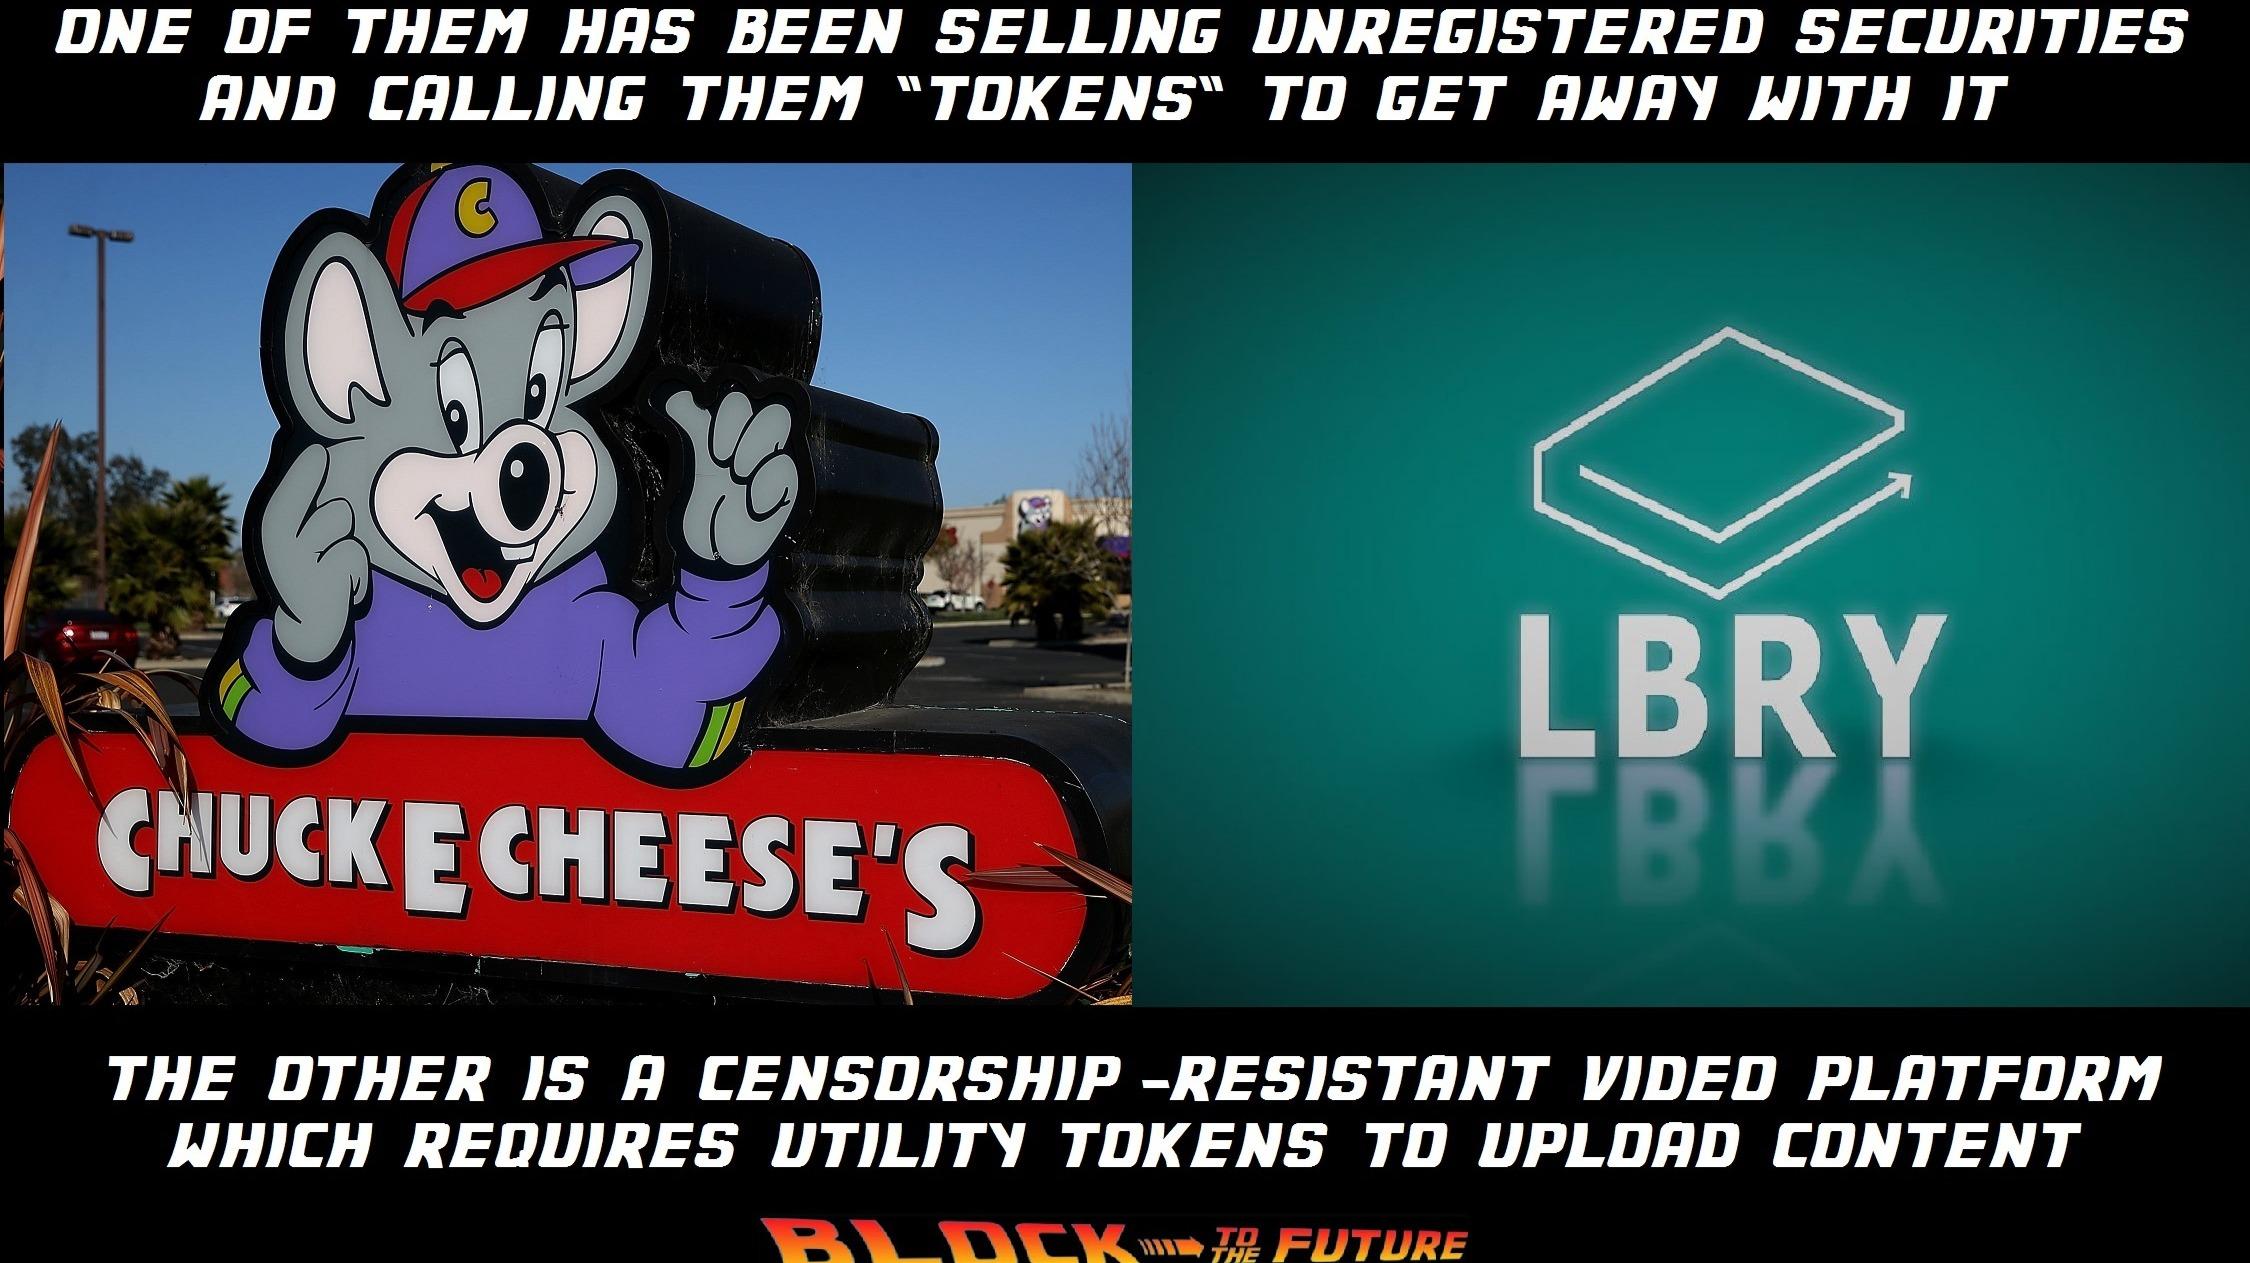 LBRY versus chuck e cheese's